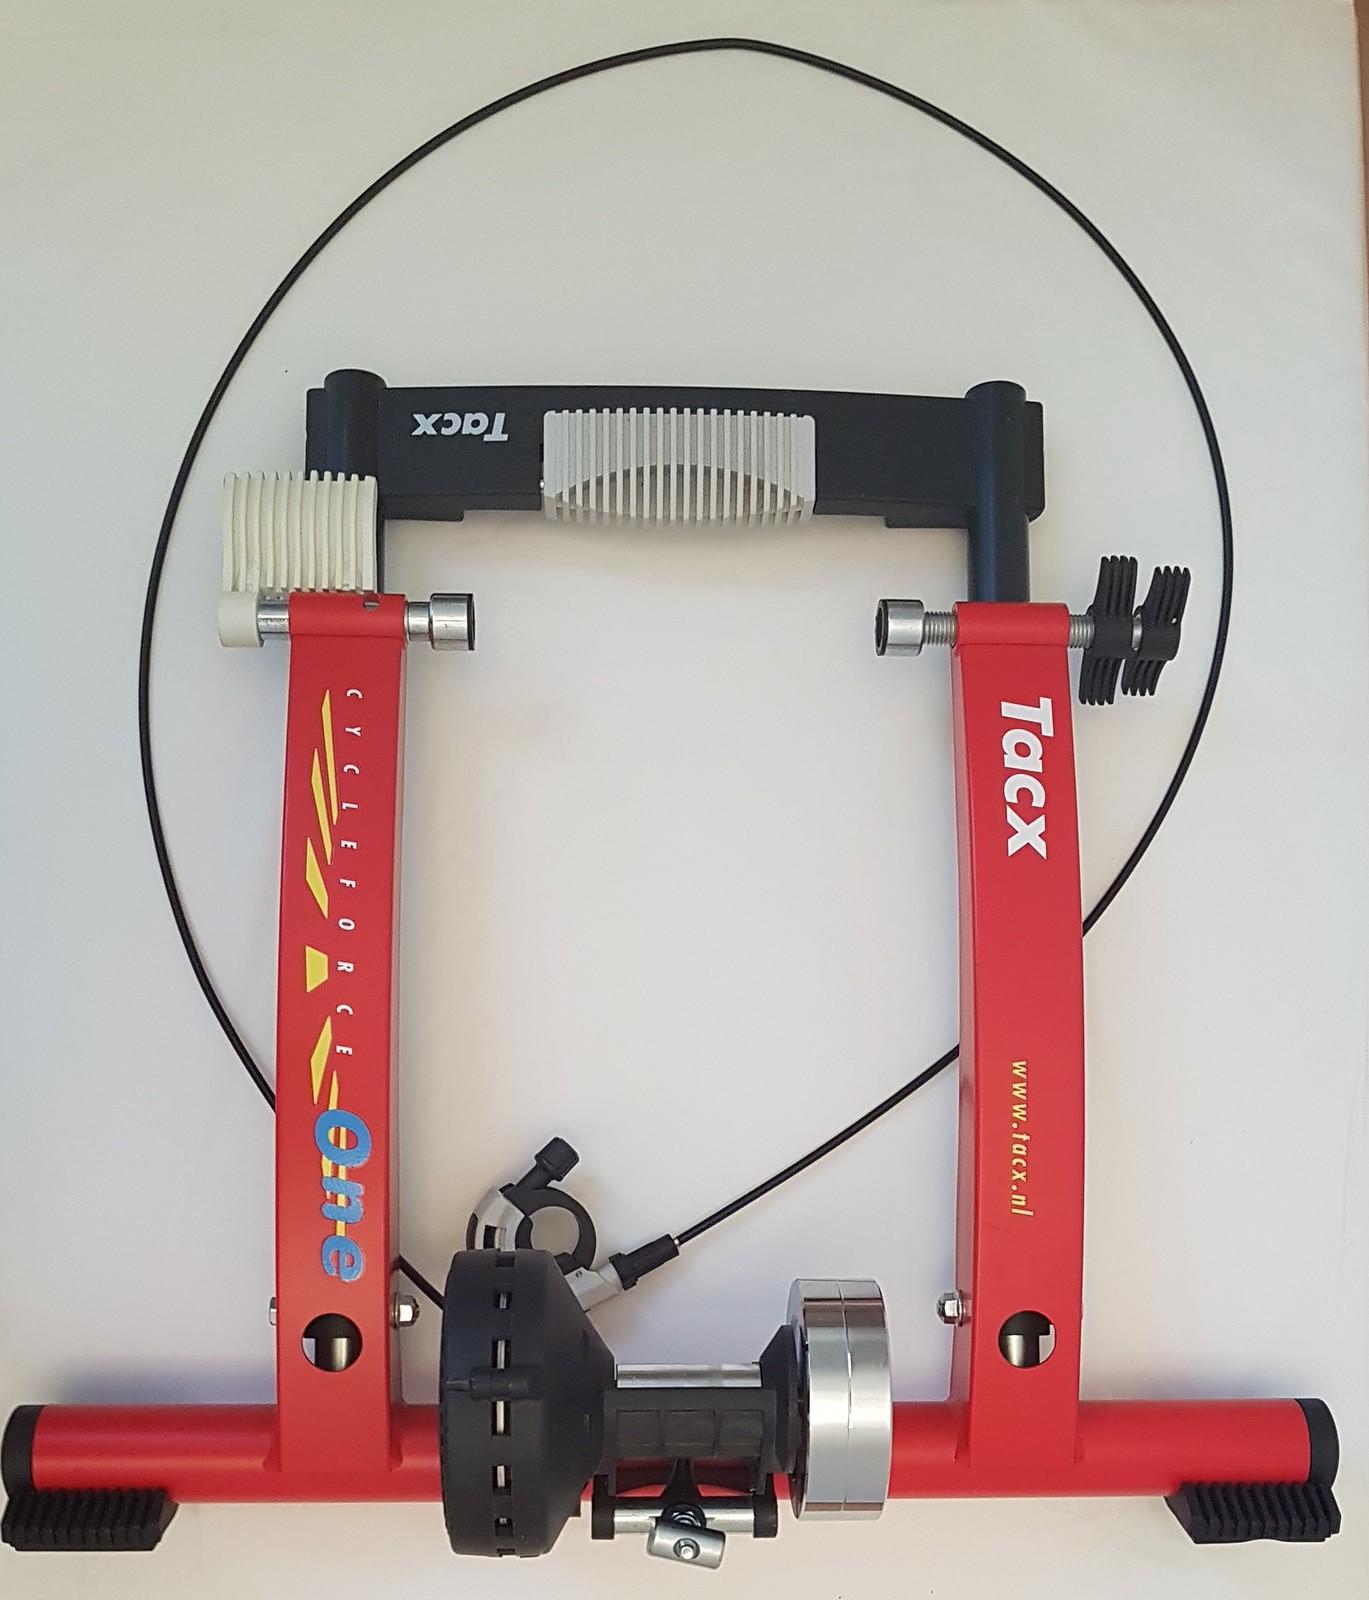 Spiksplinternieuw Tacx Rollentrainer Cycleforce ONE   Bikemarkt.MTB-News.de IP-93